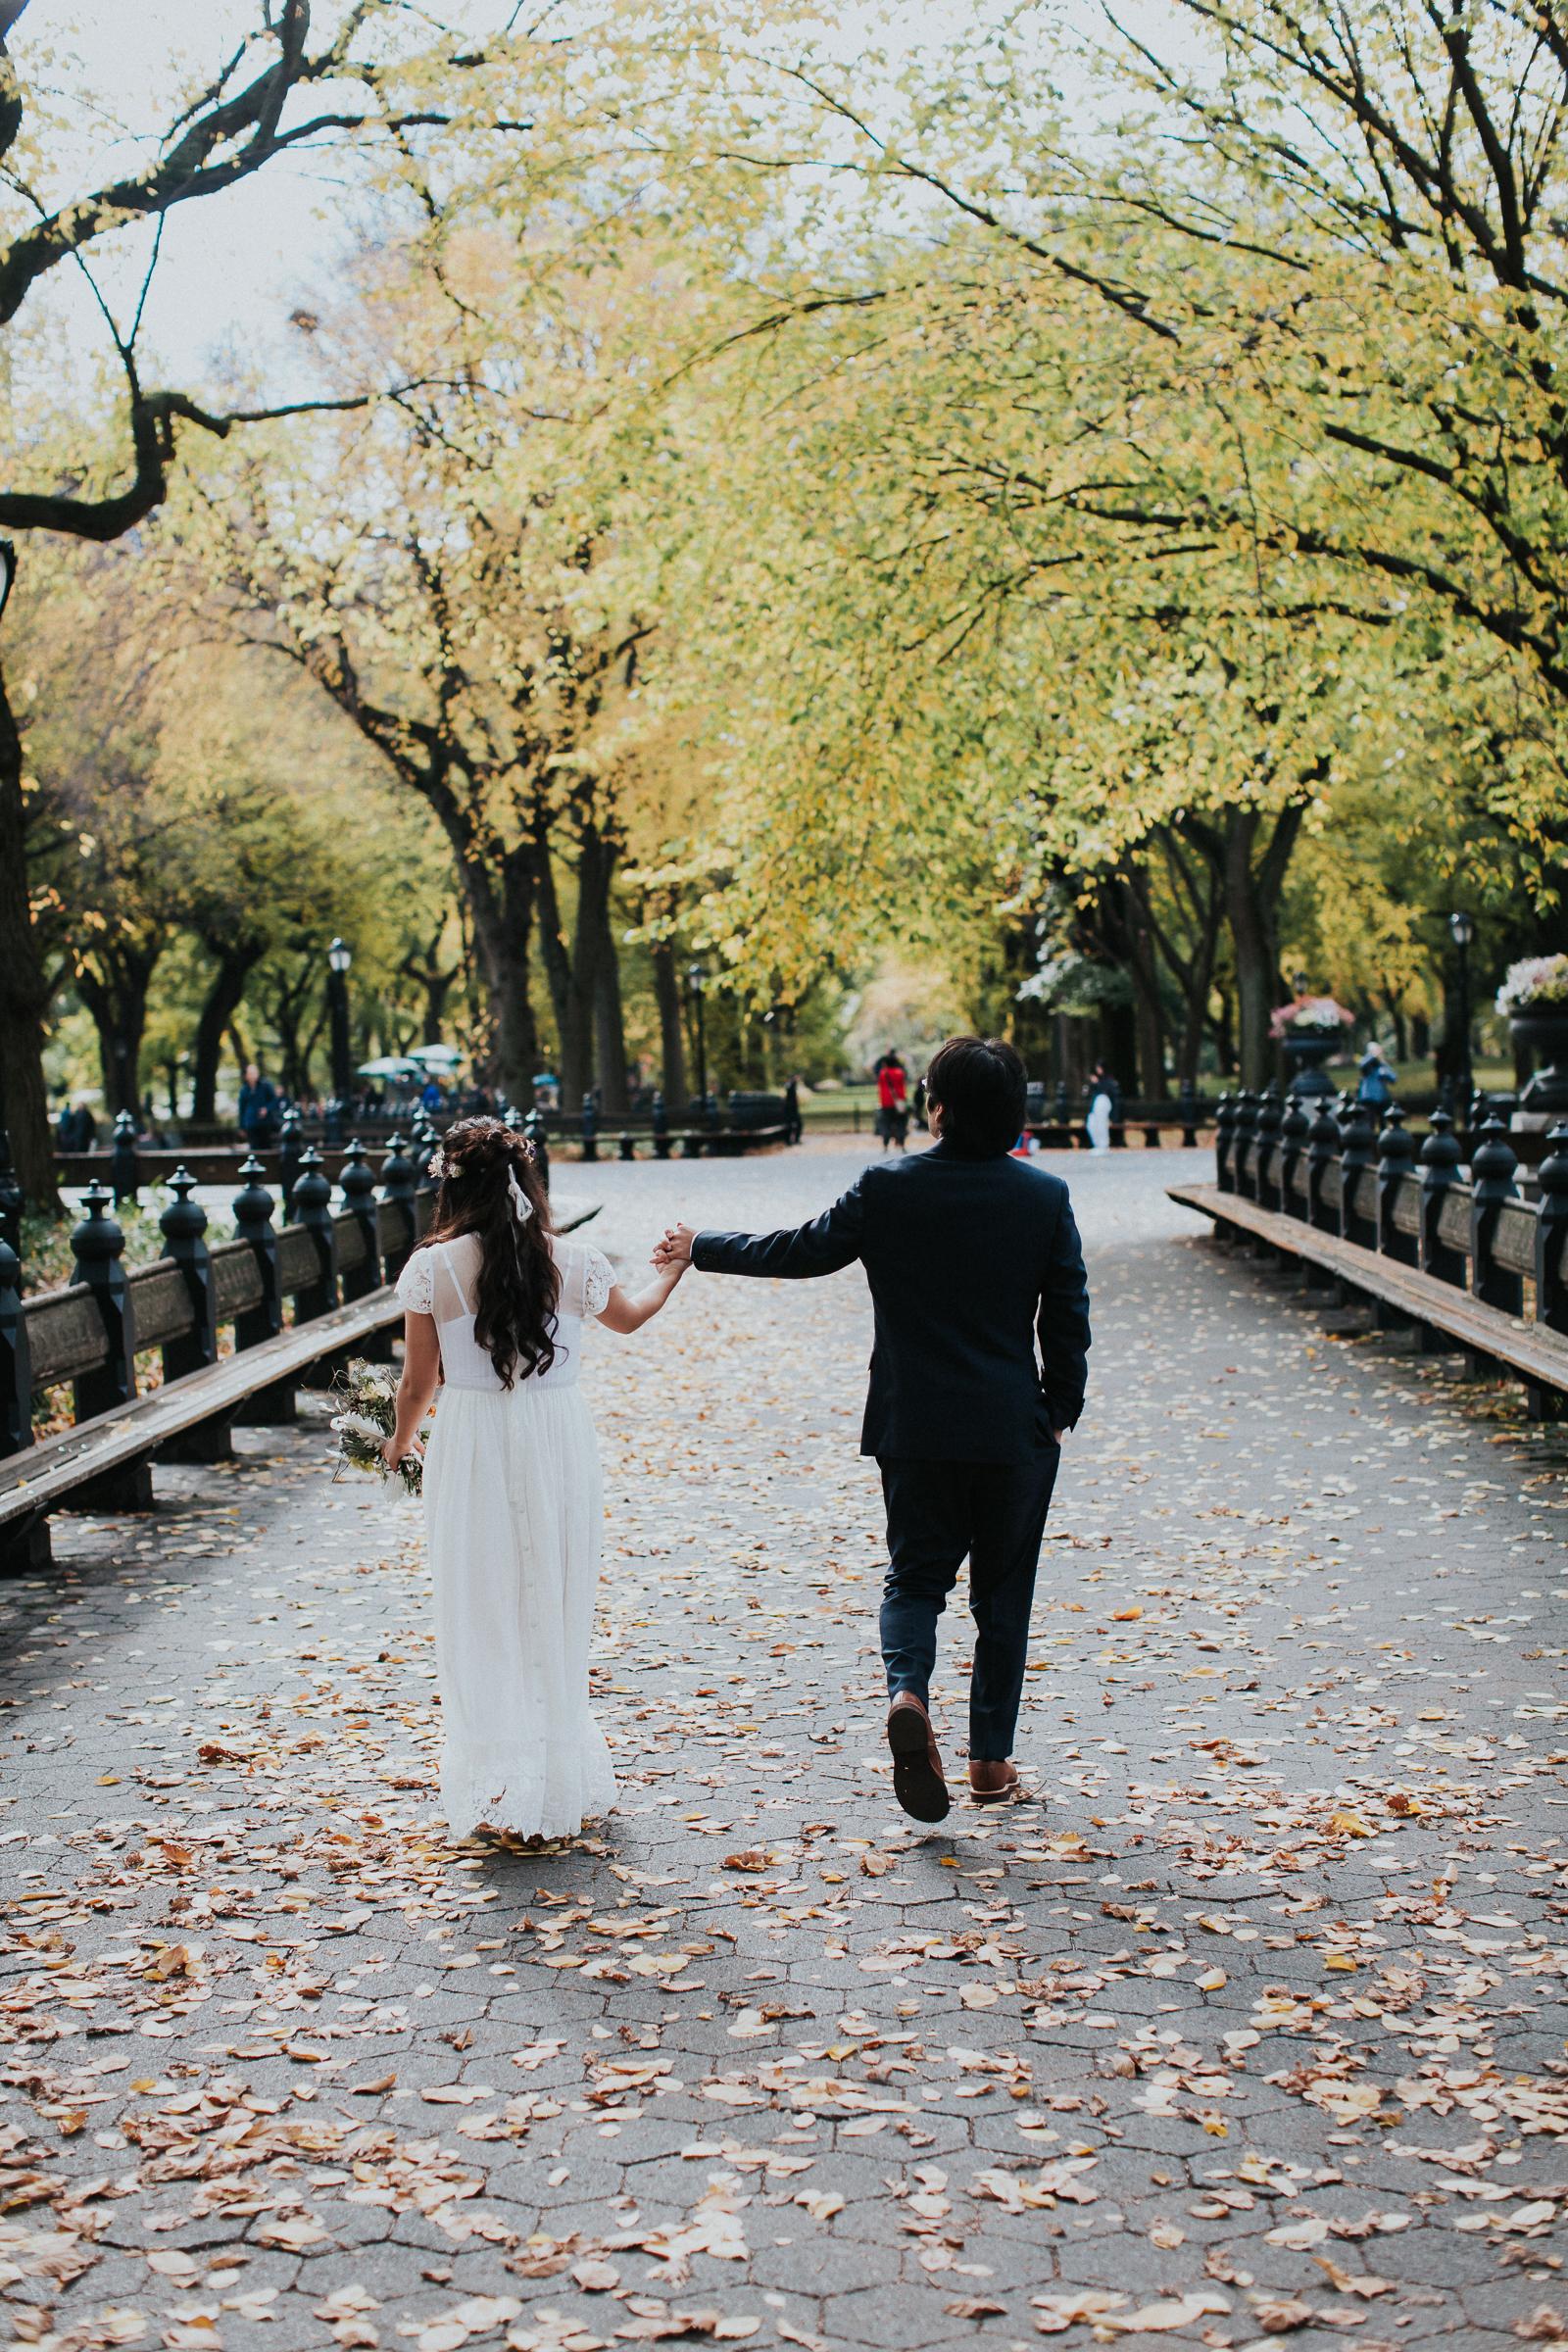 Central-Park-Brooklyn-Bridge-Dumbo-NYC-Documentary-Wedding-Photographer-44.jpg